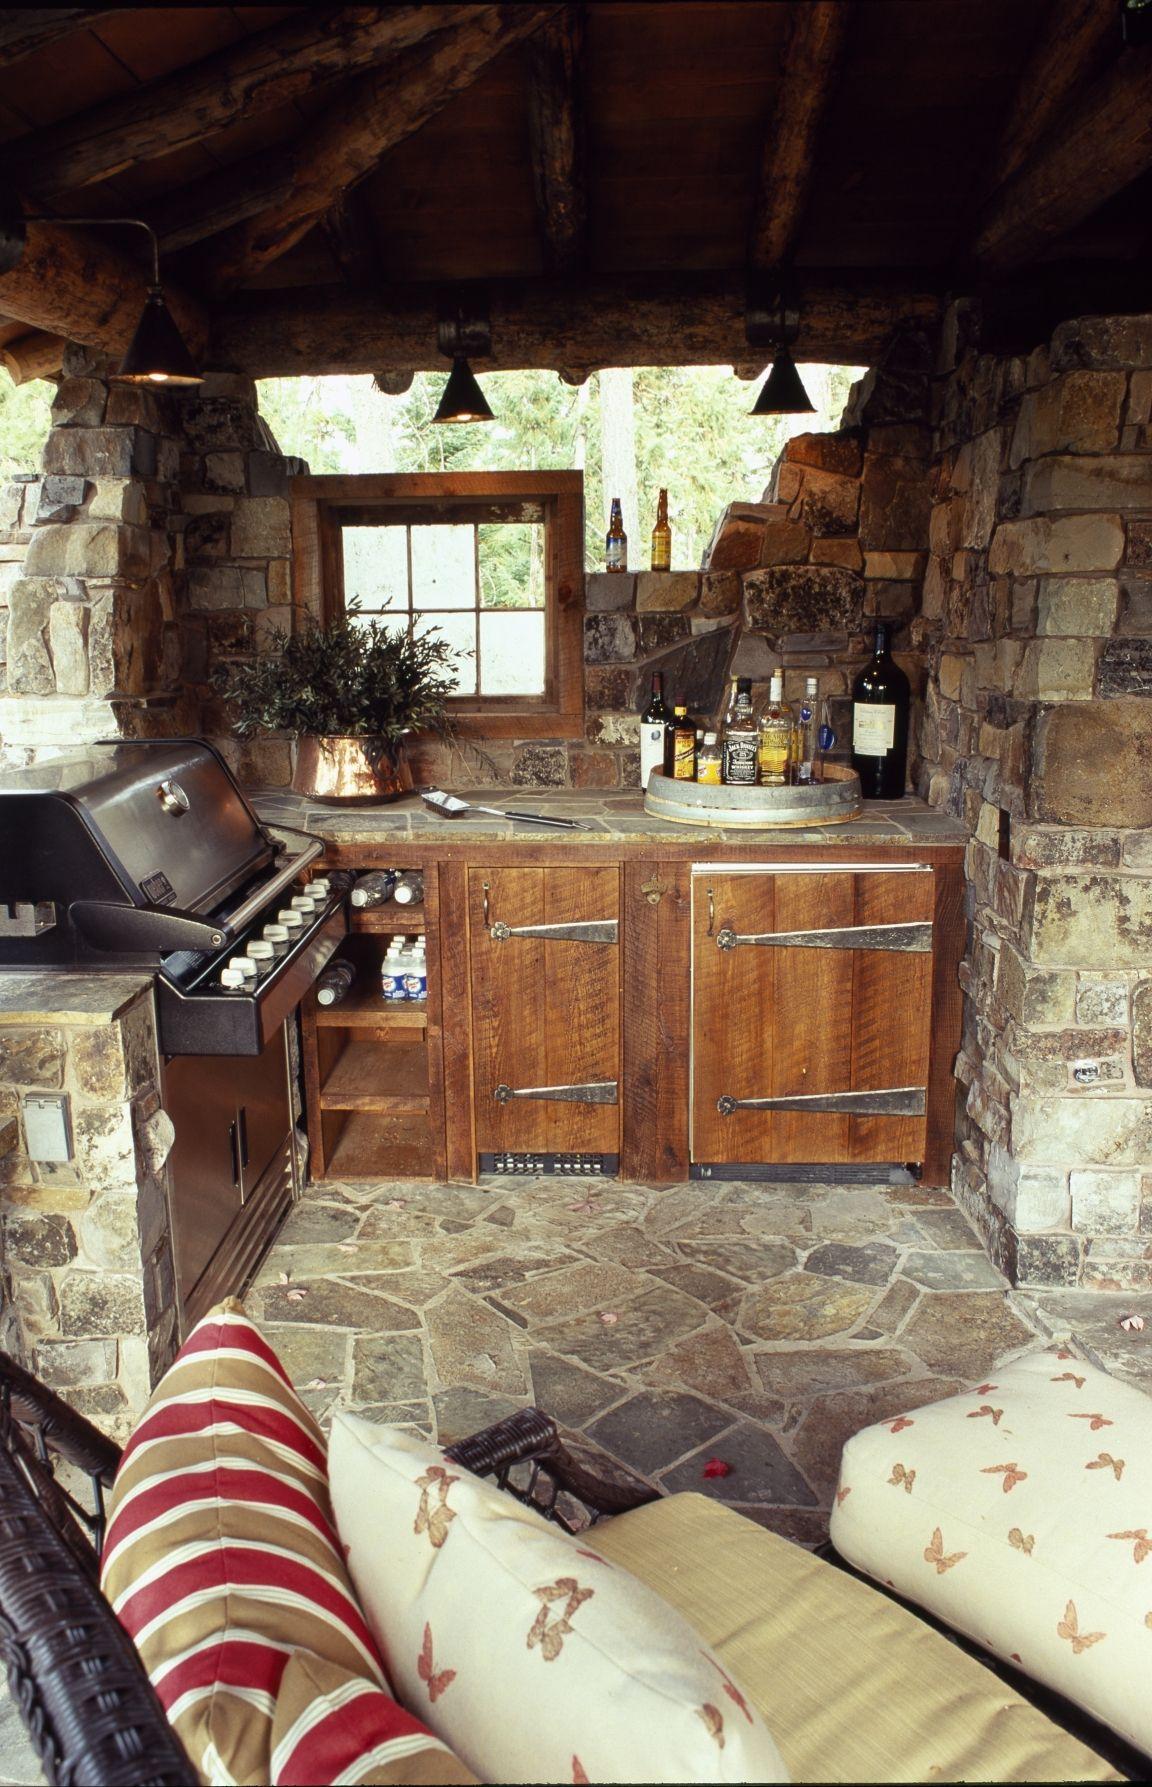 Rustic outdoor kitchen | Rustic outdoor kitchens, Bohemian ...